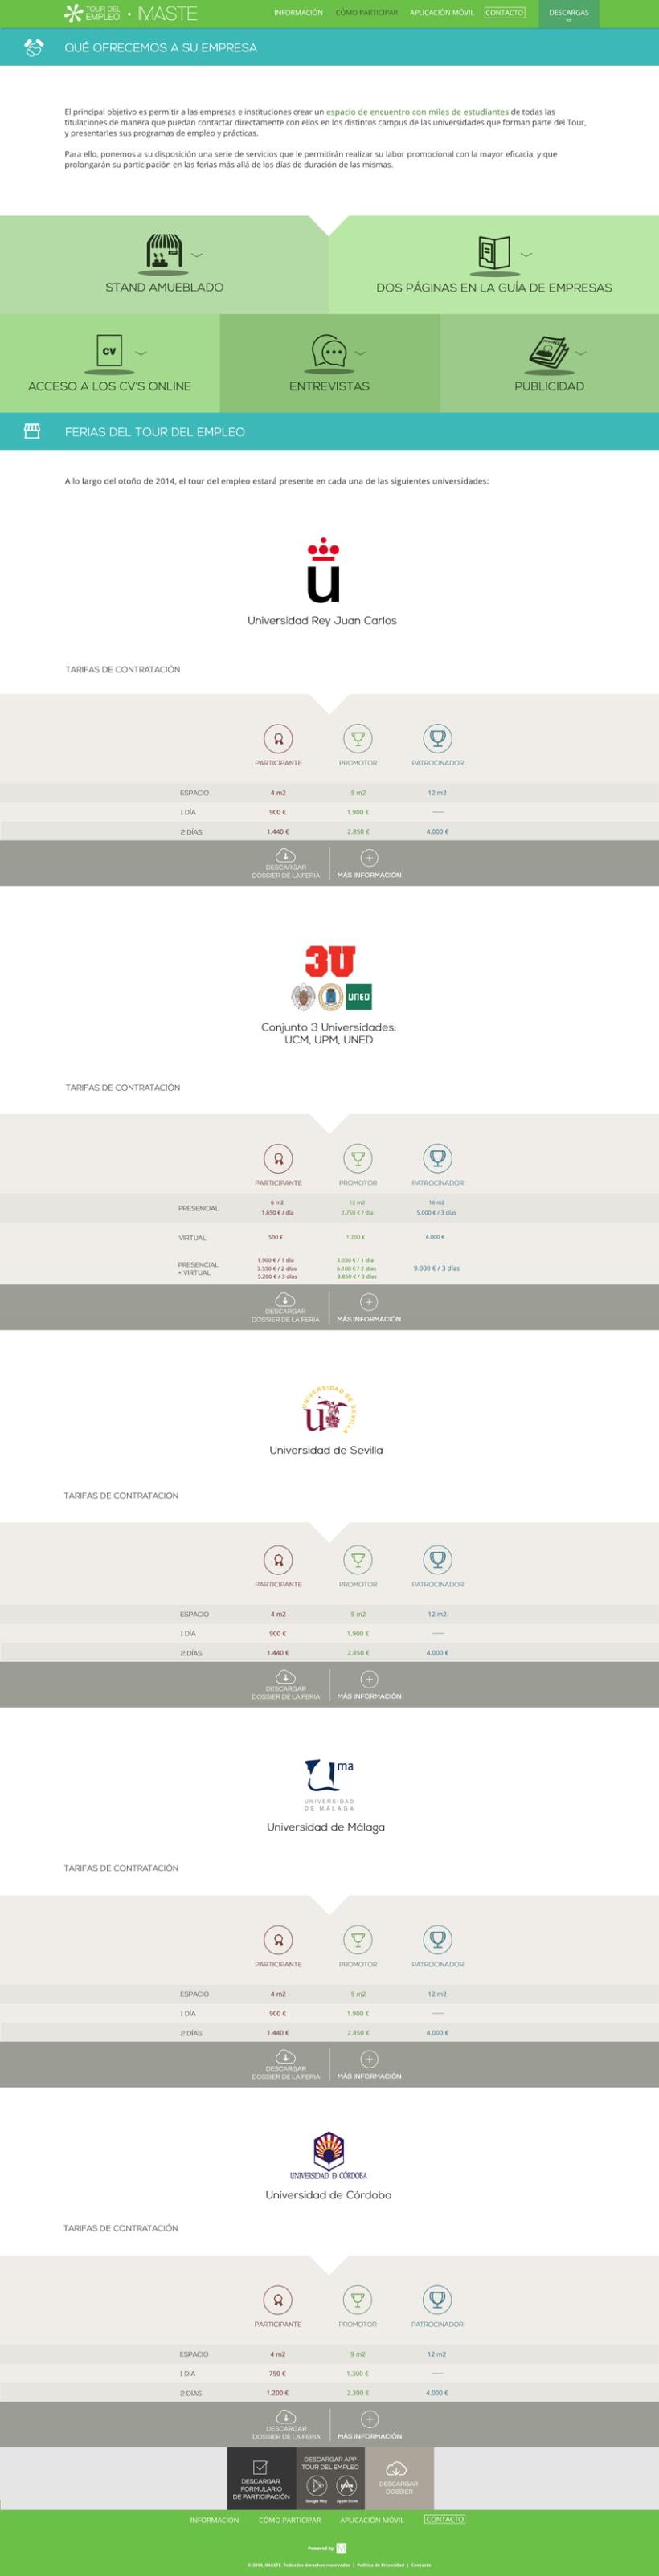 Web design & development for job fair sites 2